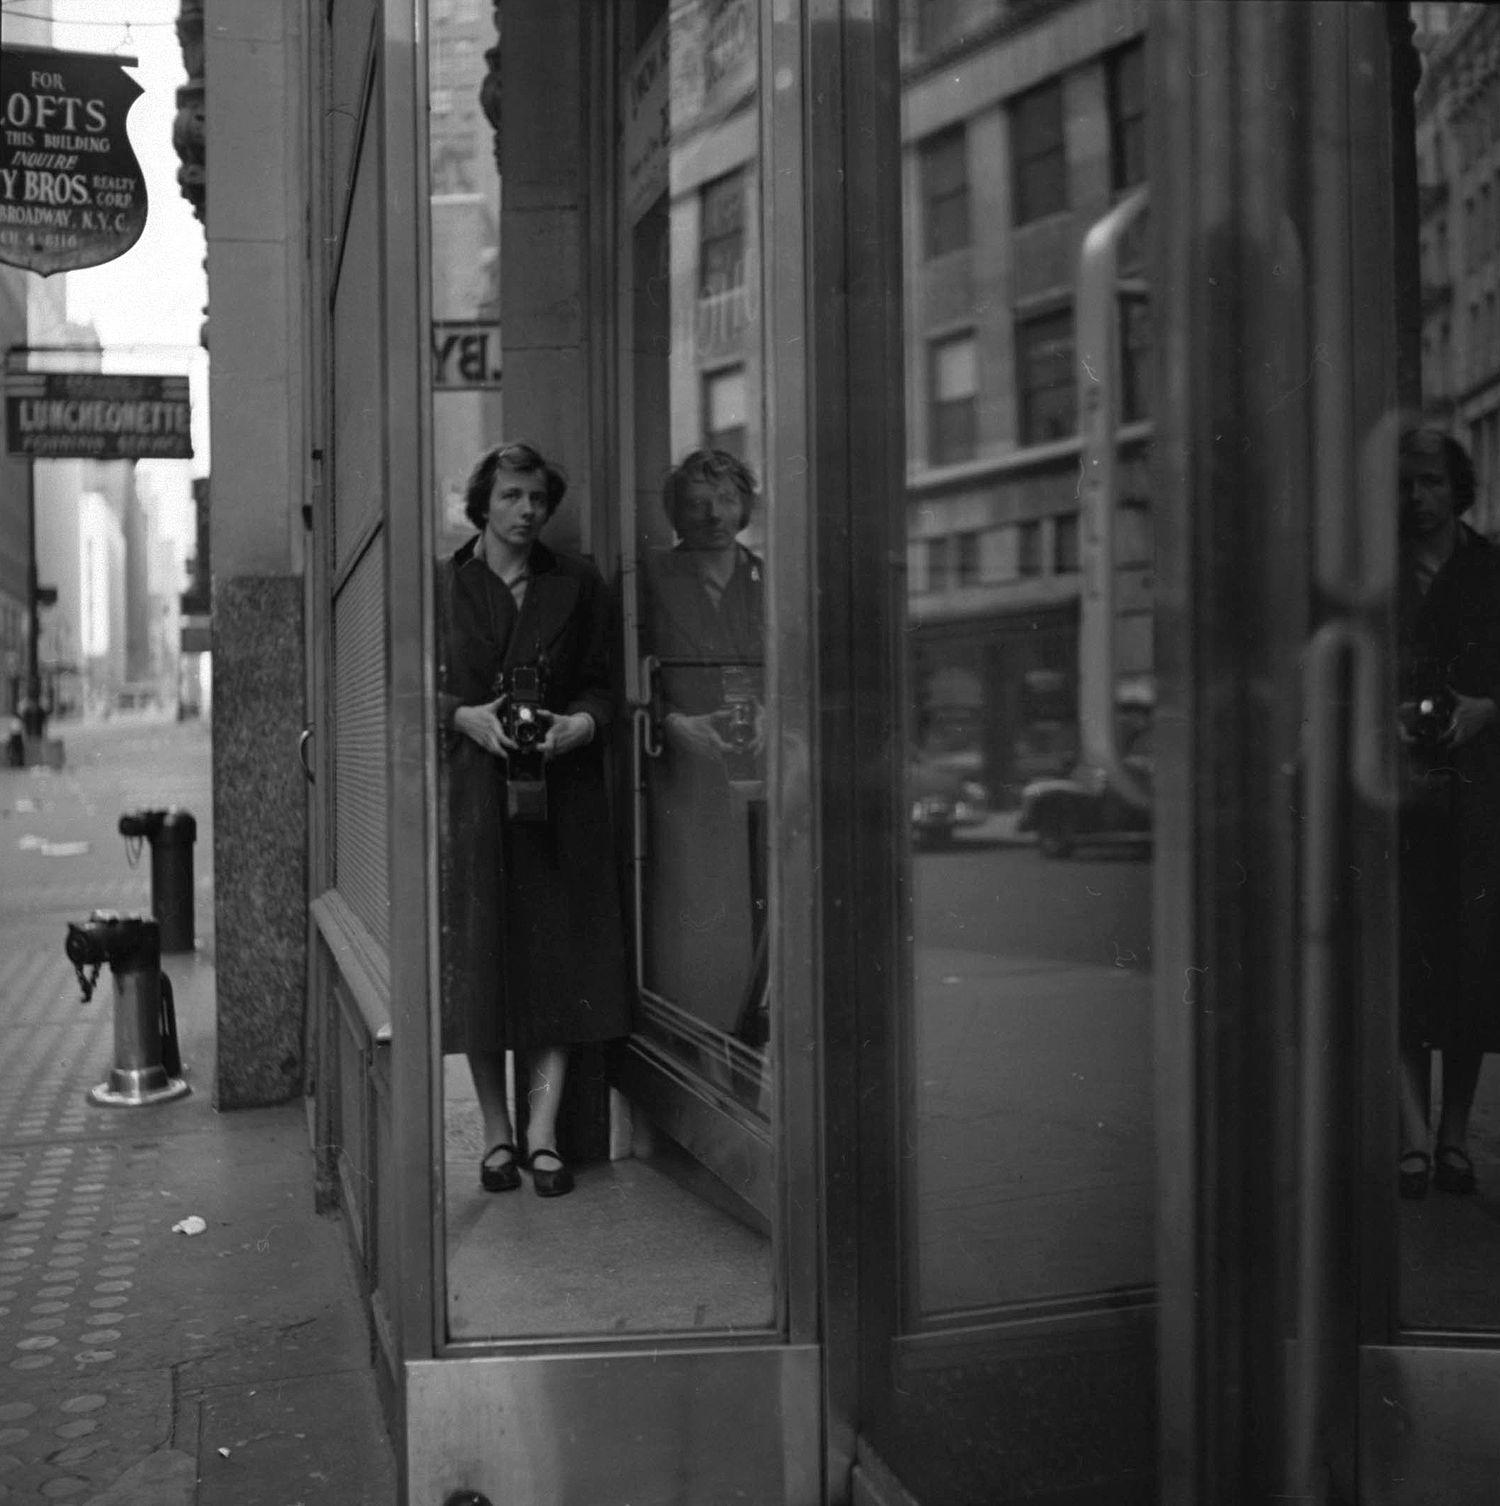 Akris x Vivian Maier 2017 Howard Greenberg Gallery